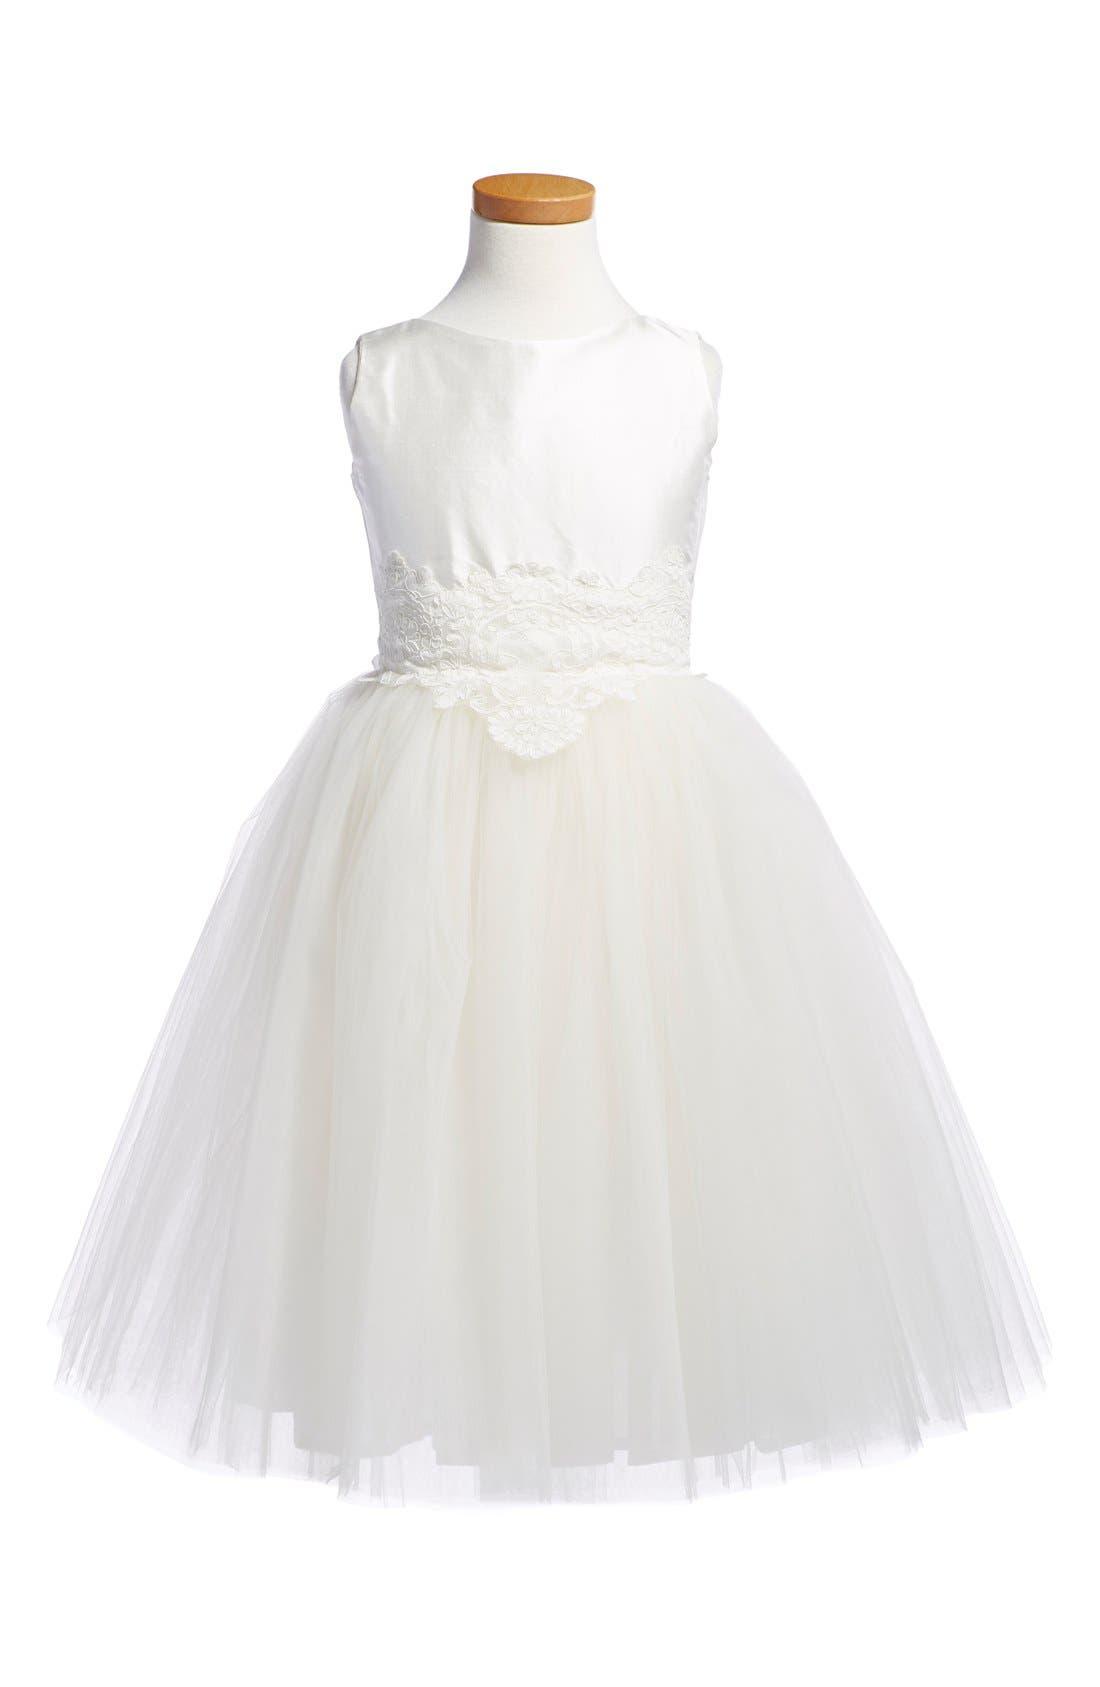 'Enchanting' Sleeveless Taffeta Dress,                         Main,                         color, Ivory